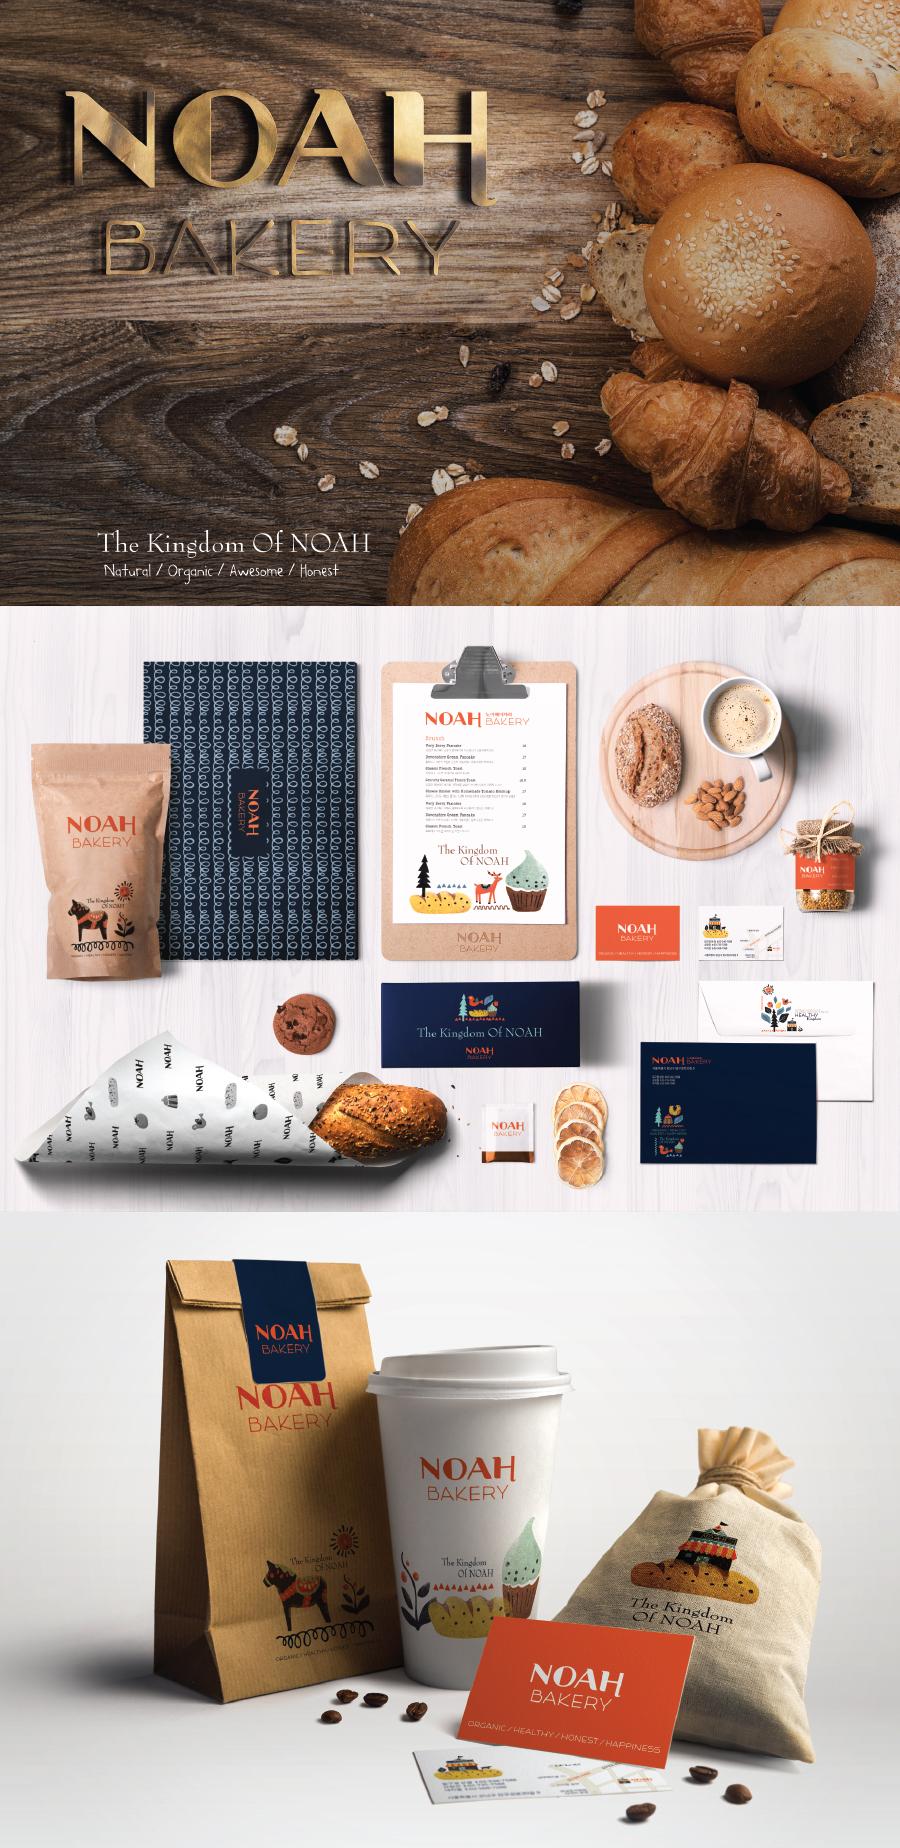 NOAH-Bakery-si-total-900_01